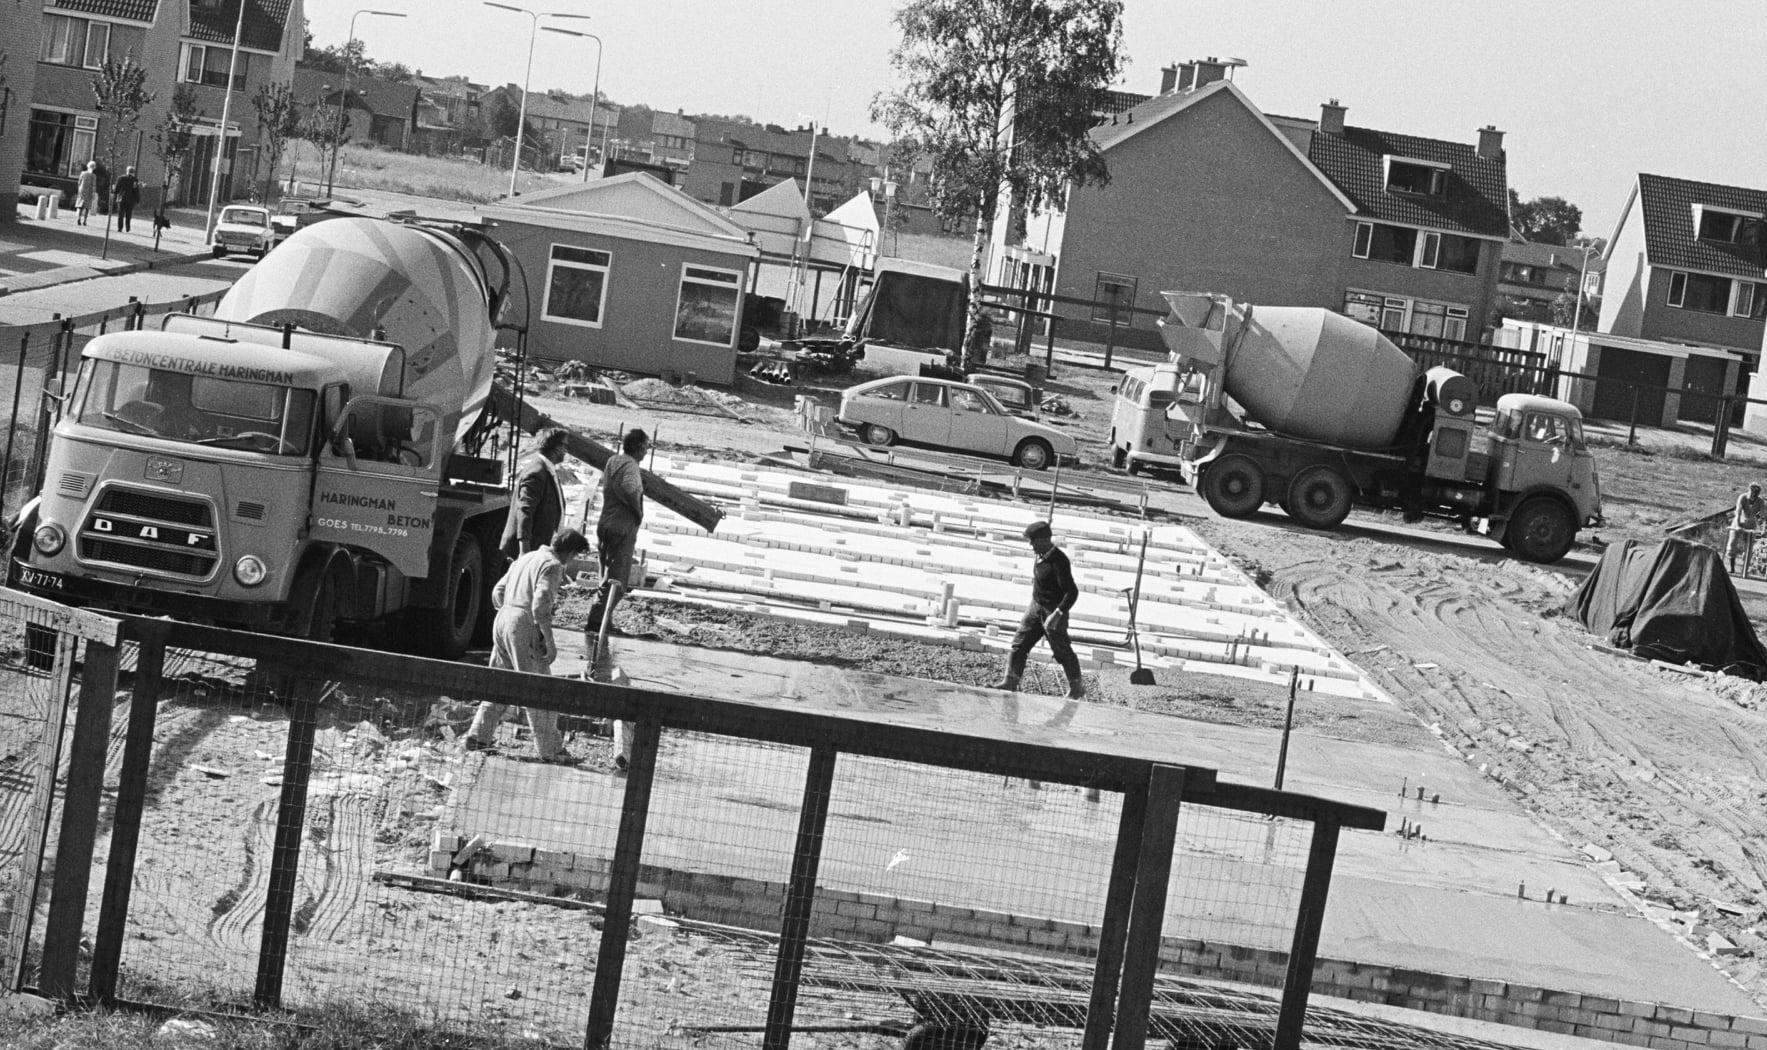 betoncentrale-Haringman-Goes--1973-